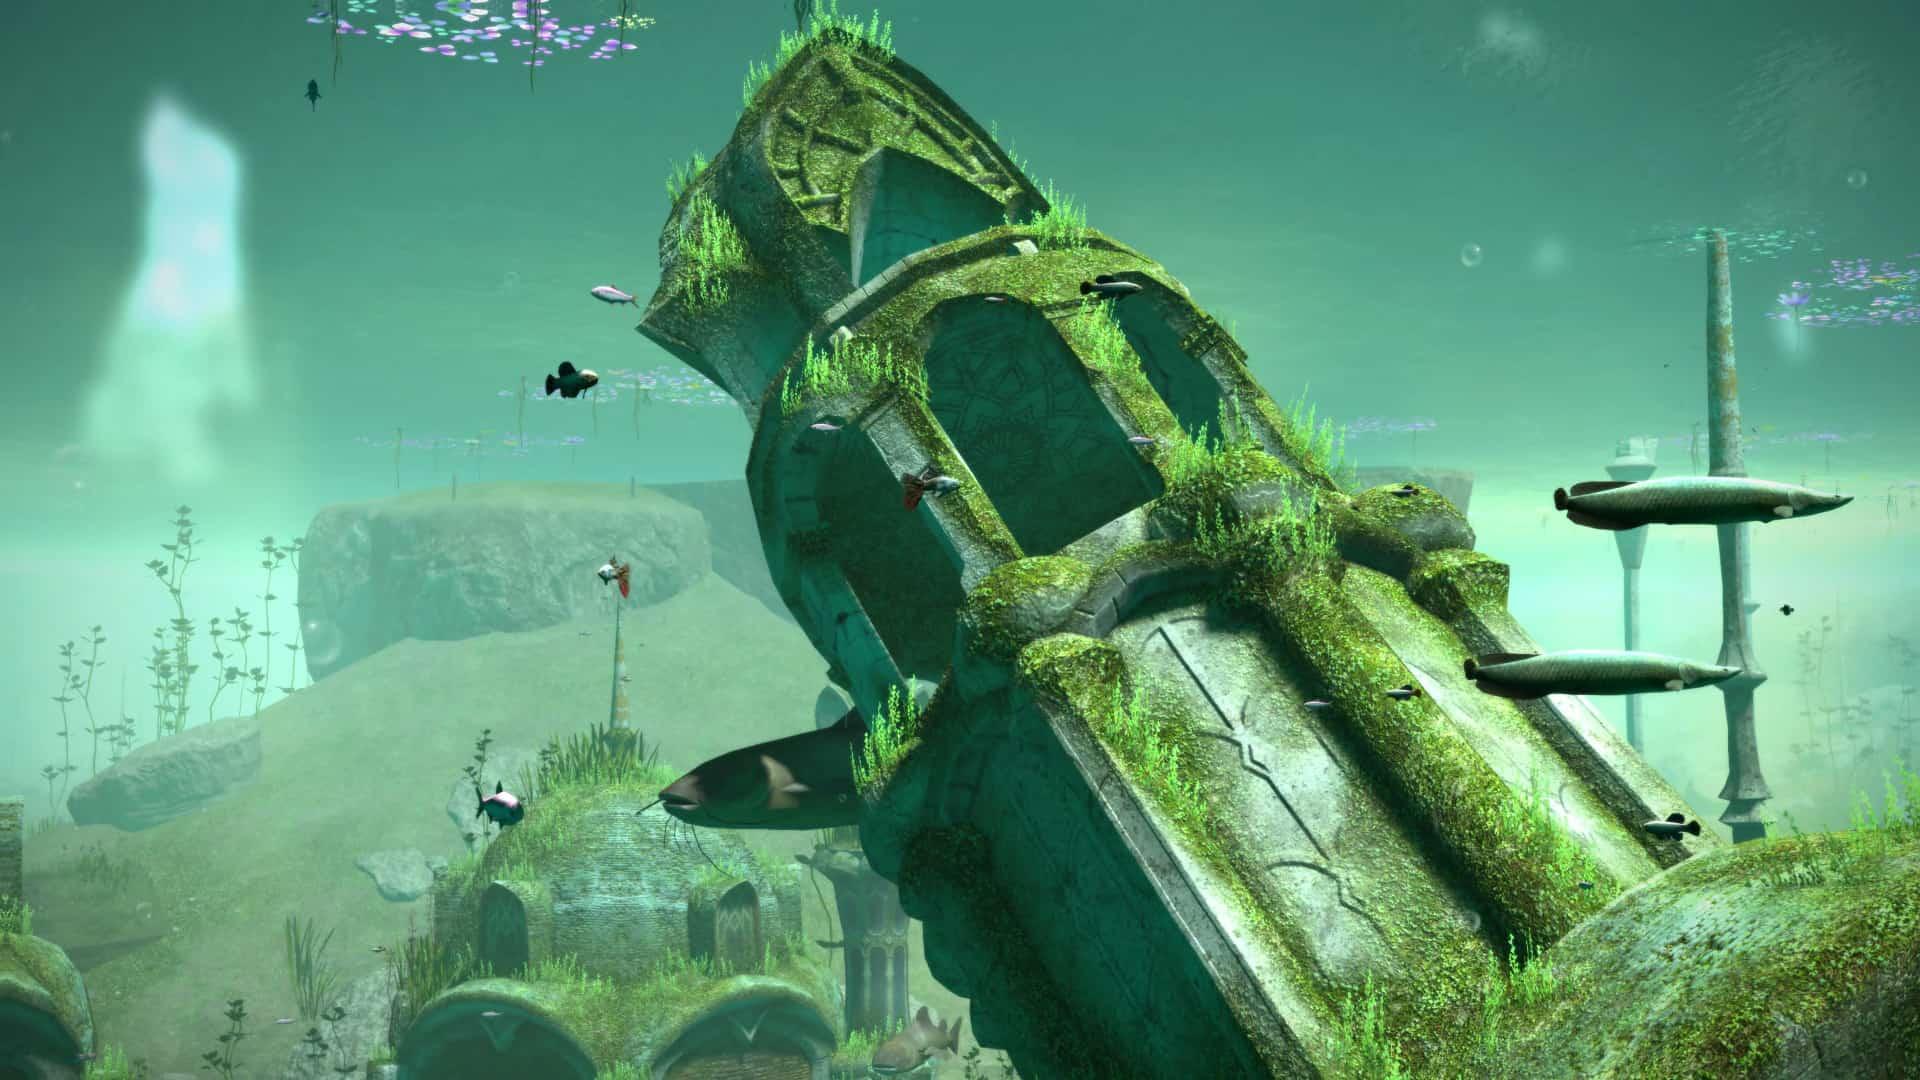 Final Fantasy XIV Online: Shadowbringers - Review | MKAU Gaming